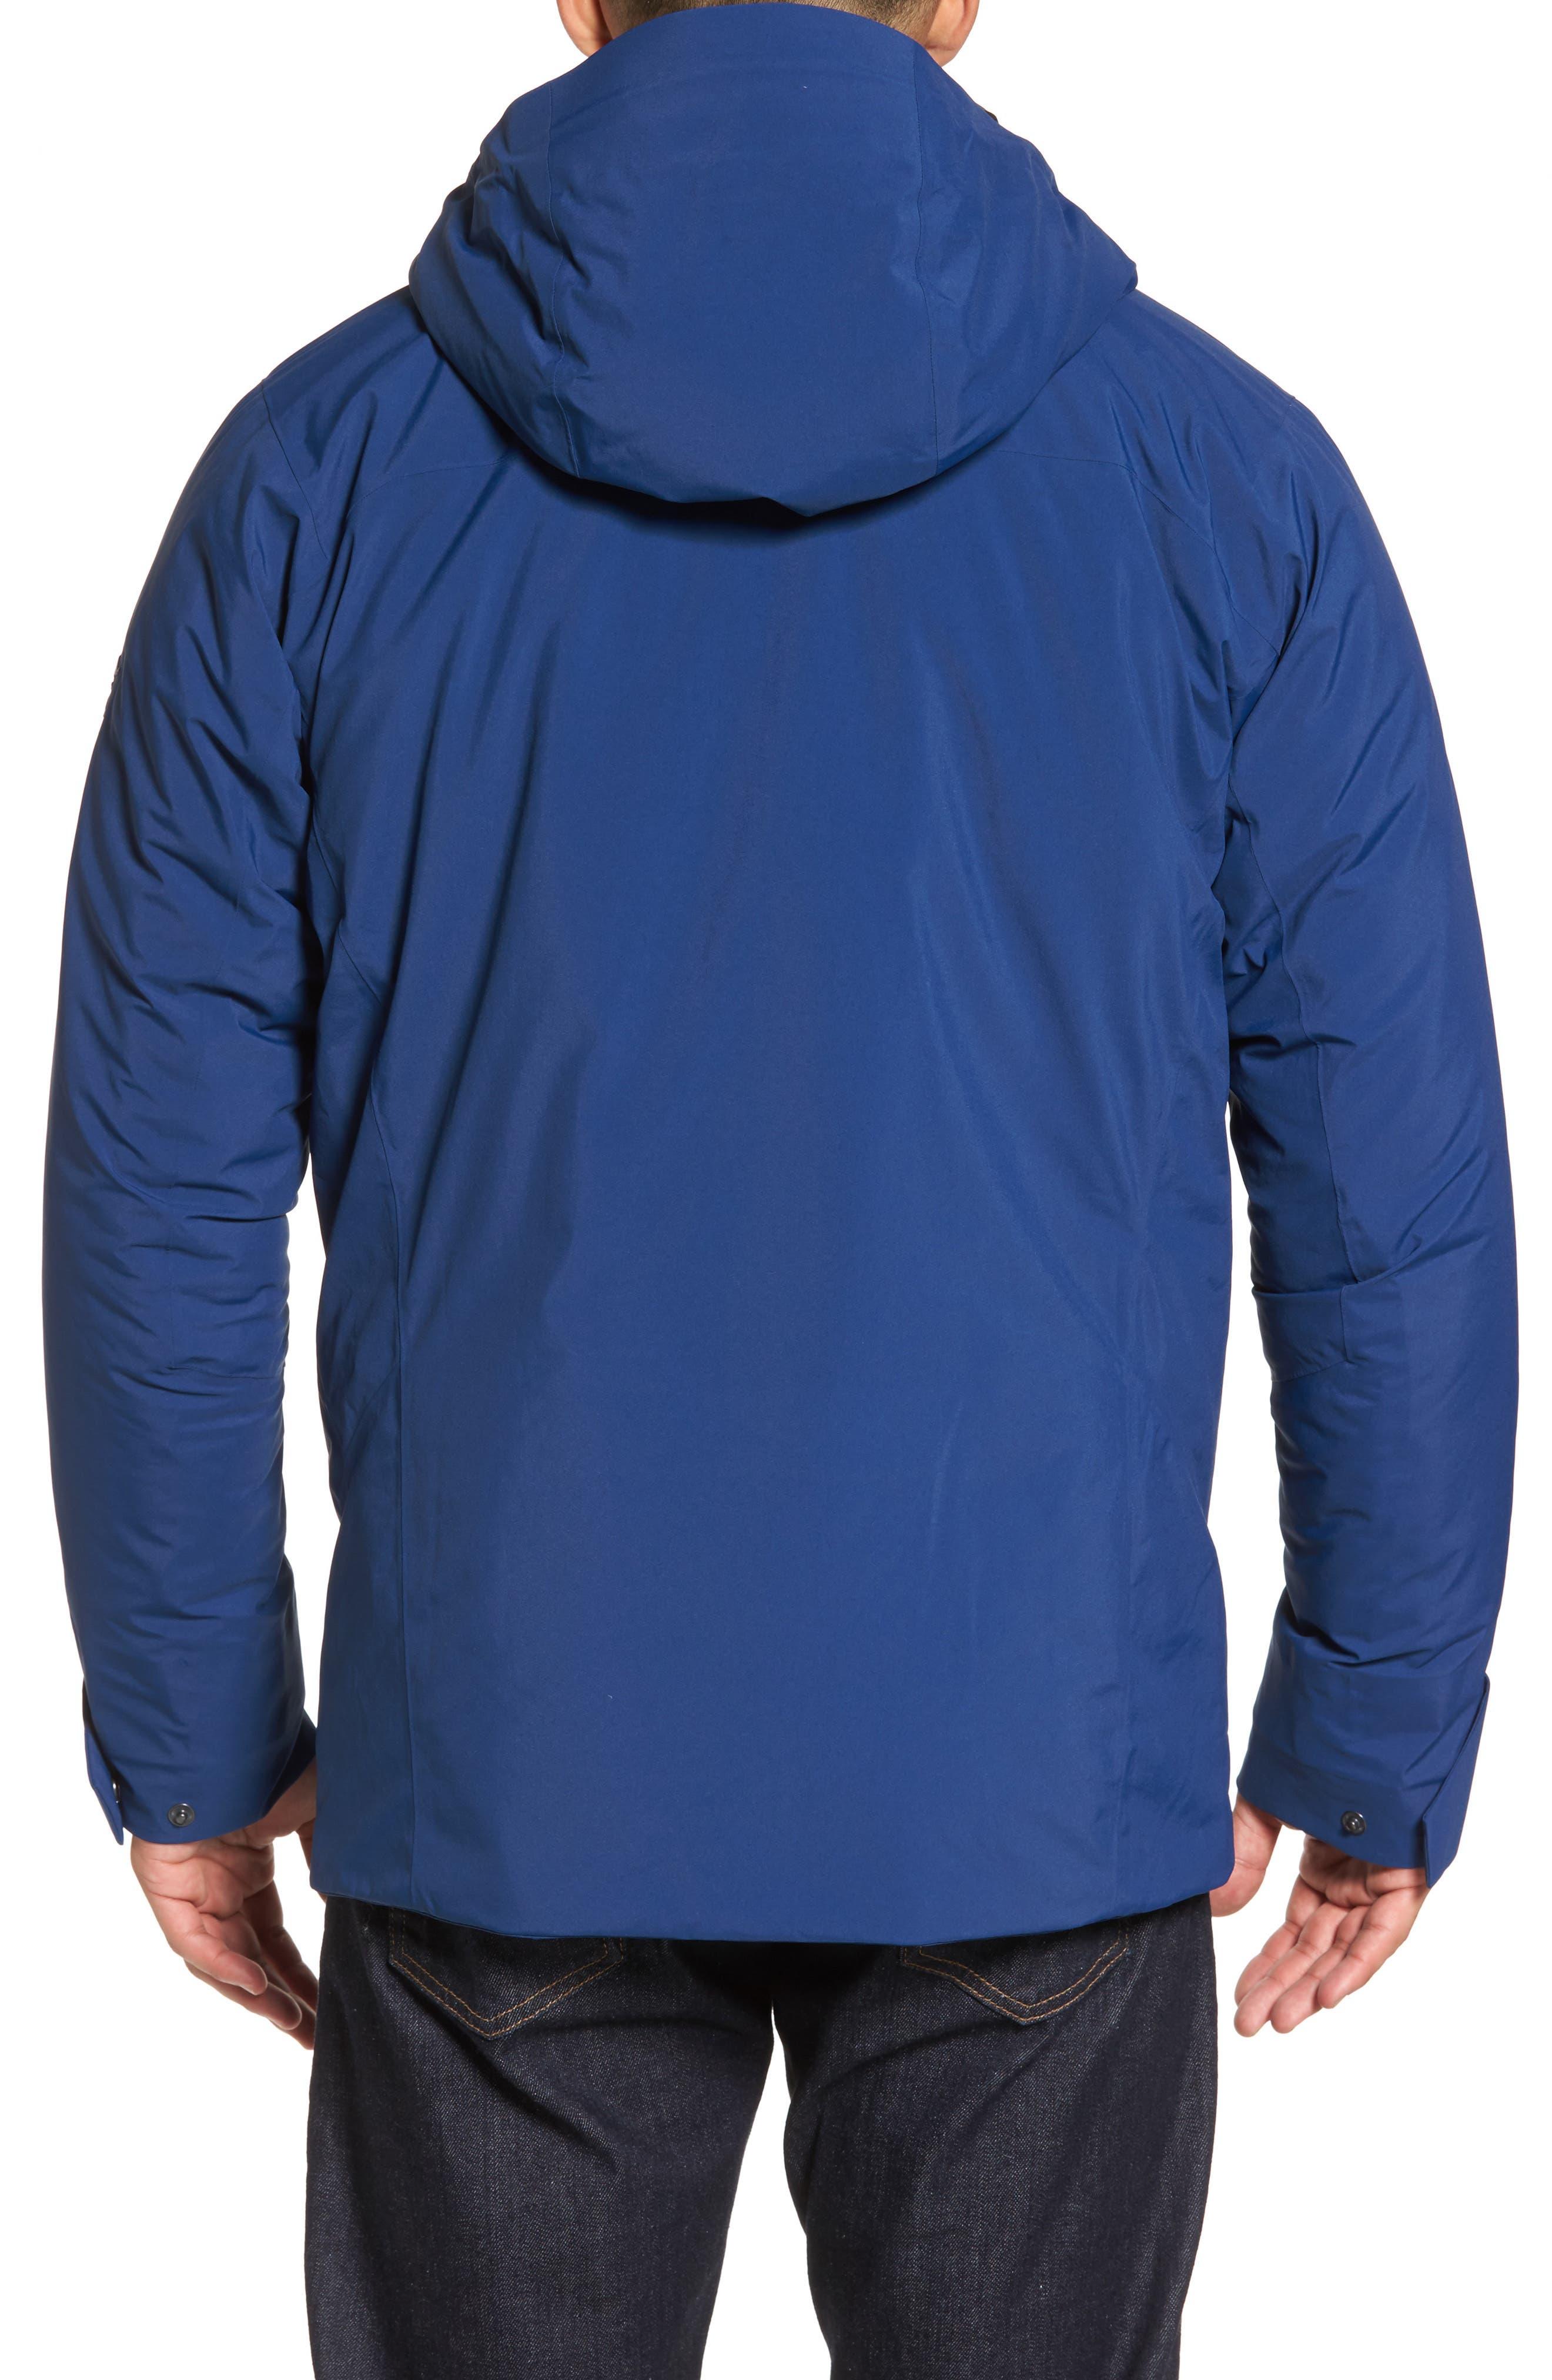 'Koda' Hooded Waterproof Shell Jacket,                             Alternate thumbnail 2, color,                             400